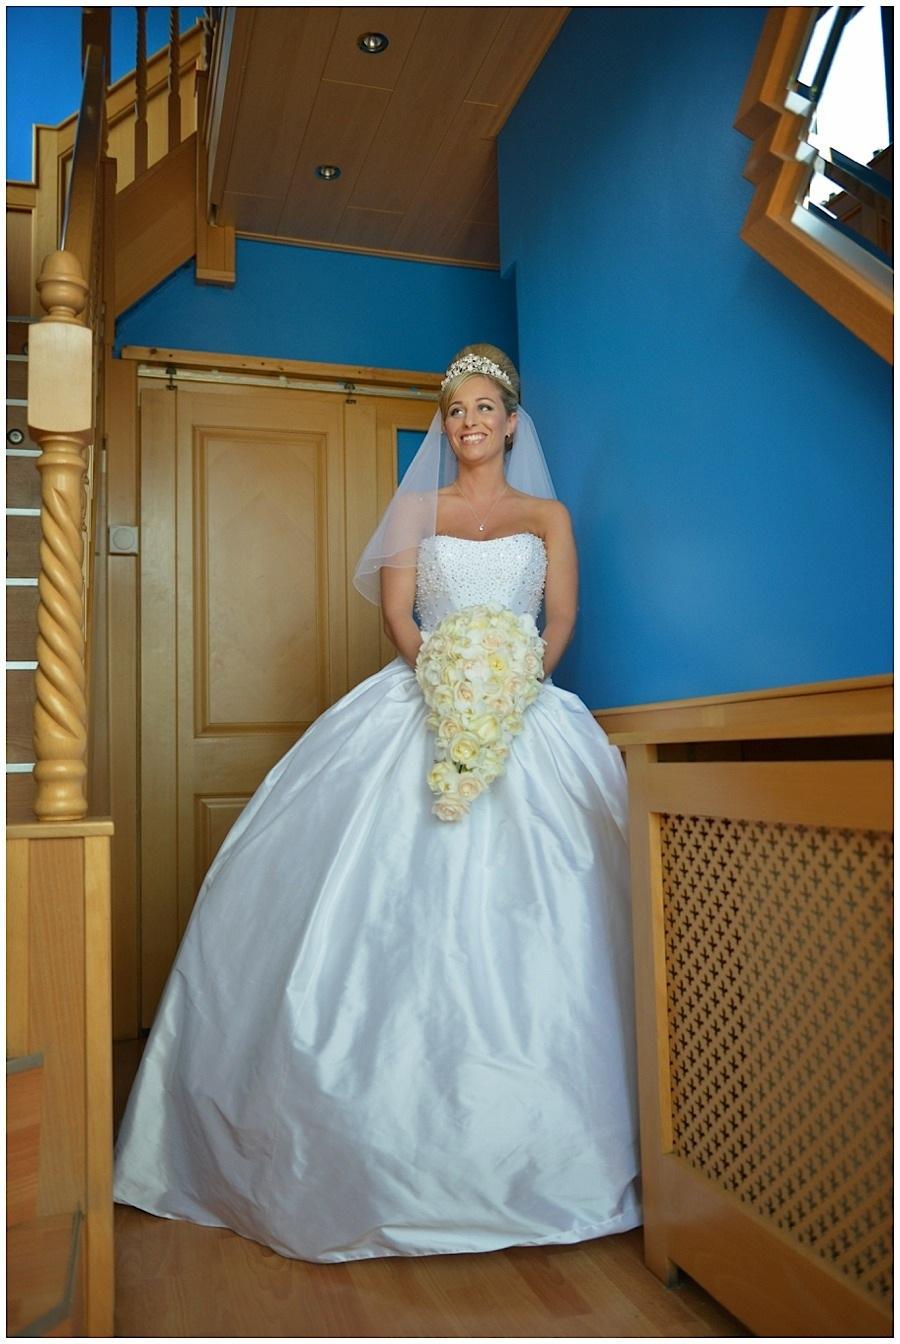 Outstanding Liverpool Wedding Dress Sketch - Womens Wedding Dresses ...